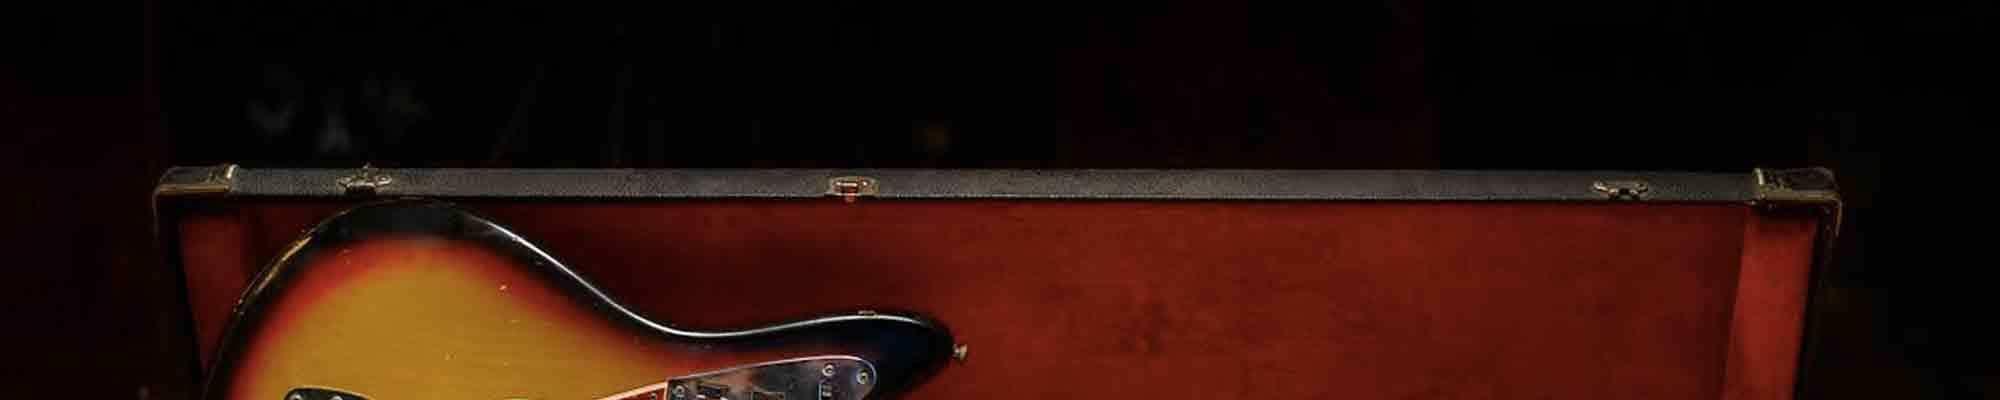 The Story Of Fender Jaguar Reverb News Jazz B Pickup Wiring Diagram